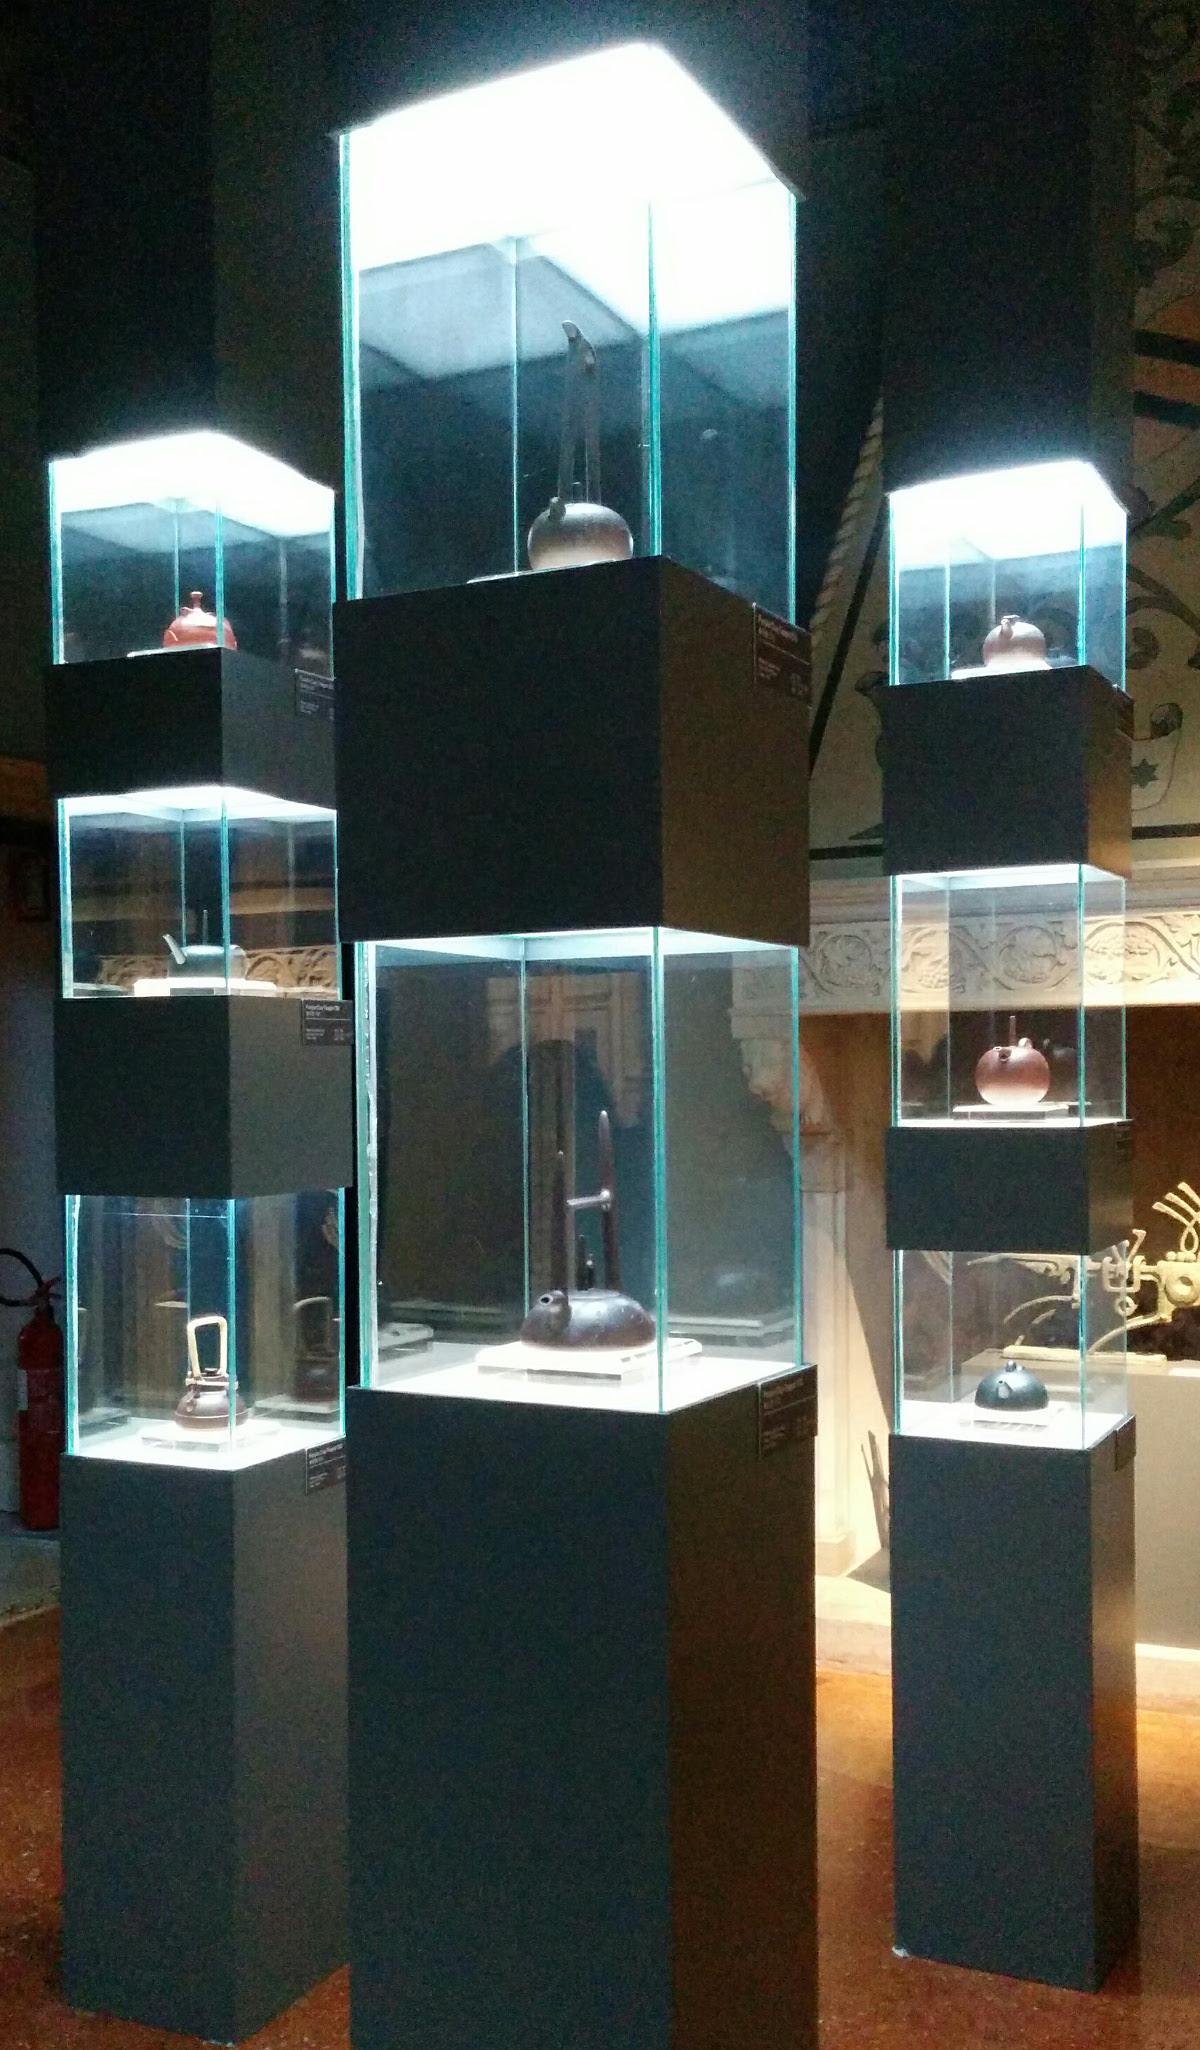 Han Meilin in Venice - display